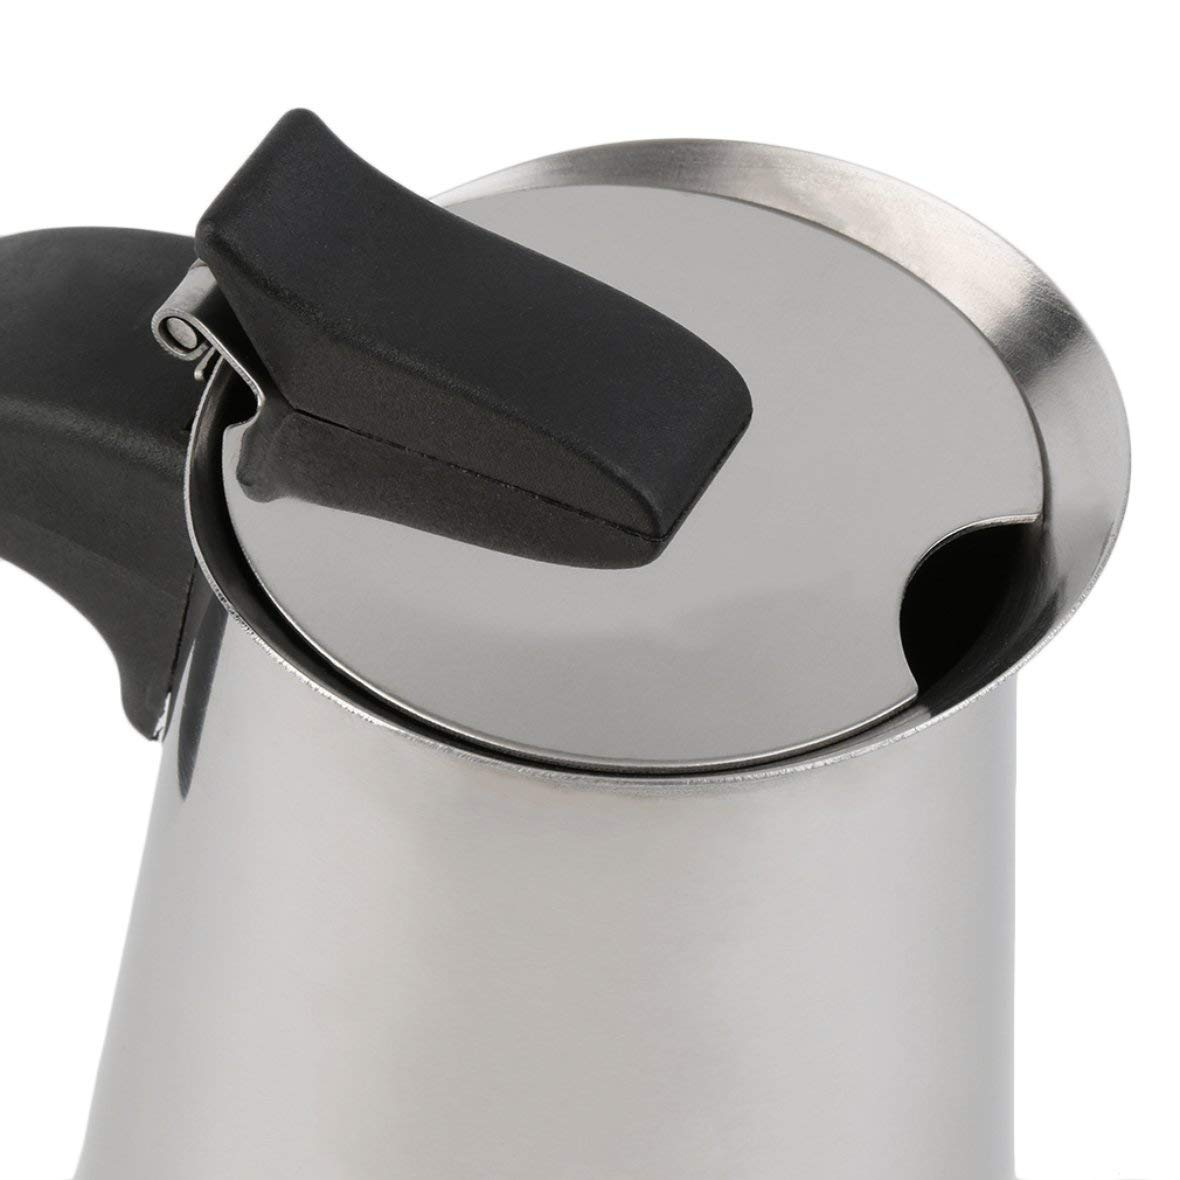 Heaviesk Kaffeekanne Percolator Herd Top Kaffeemaschine Moka Espresso Latte Edelstahl Topf